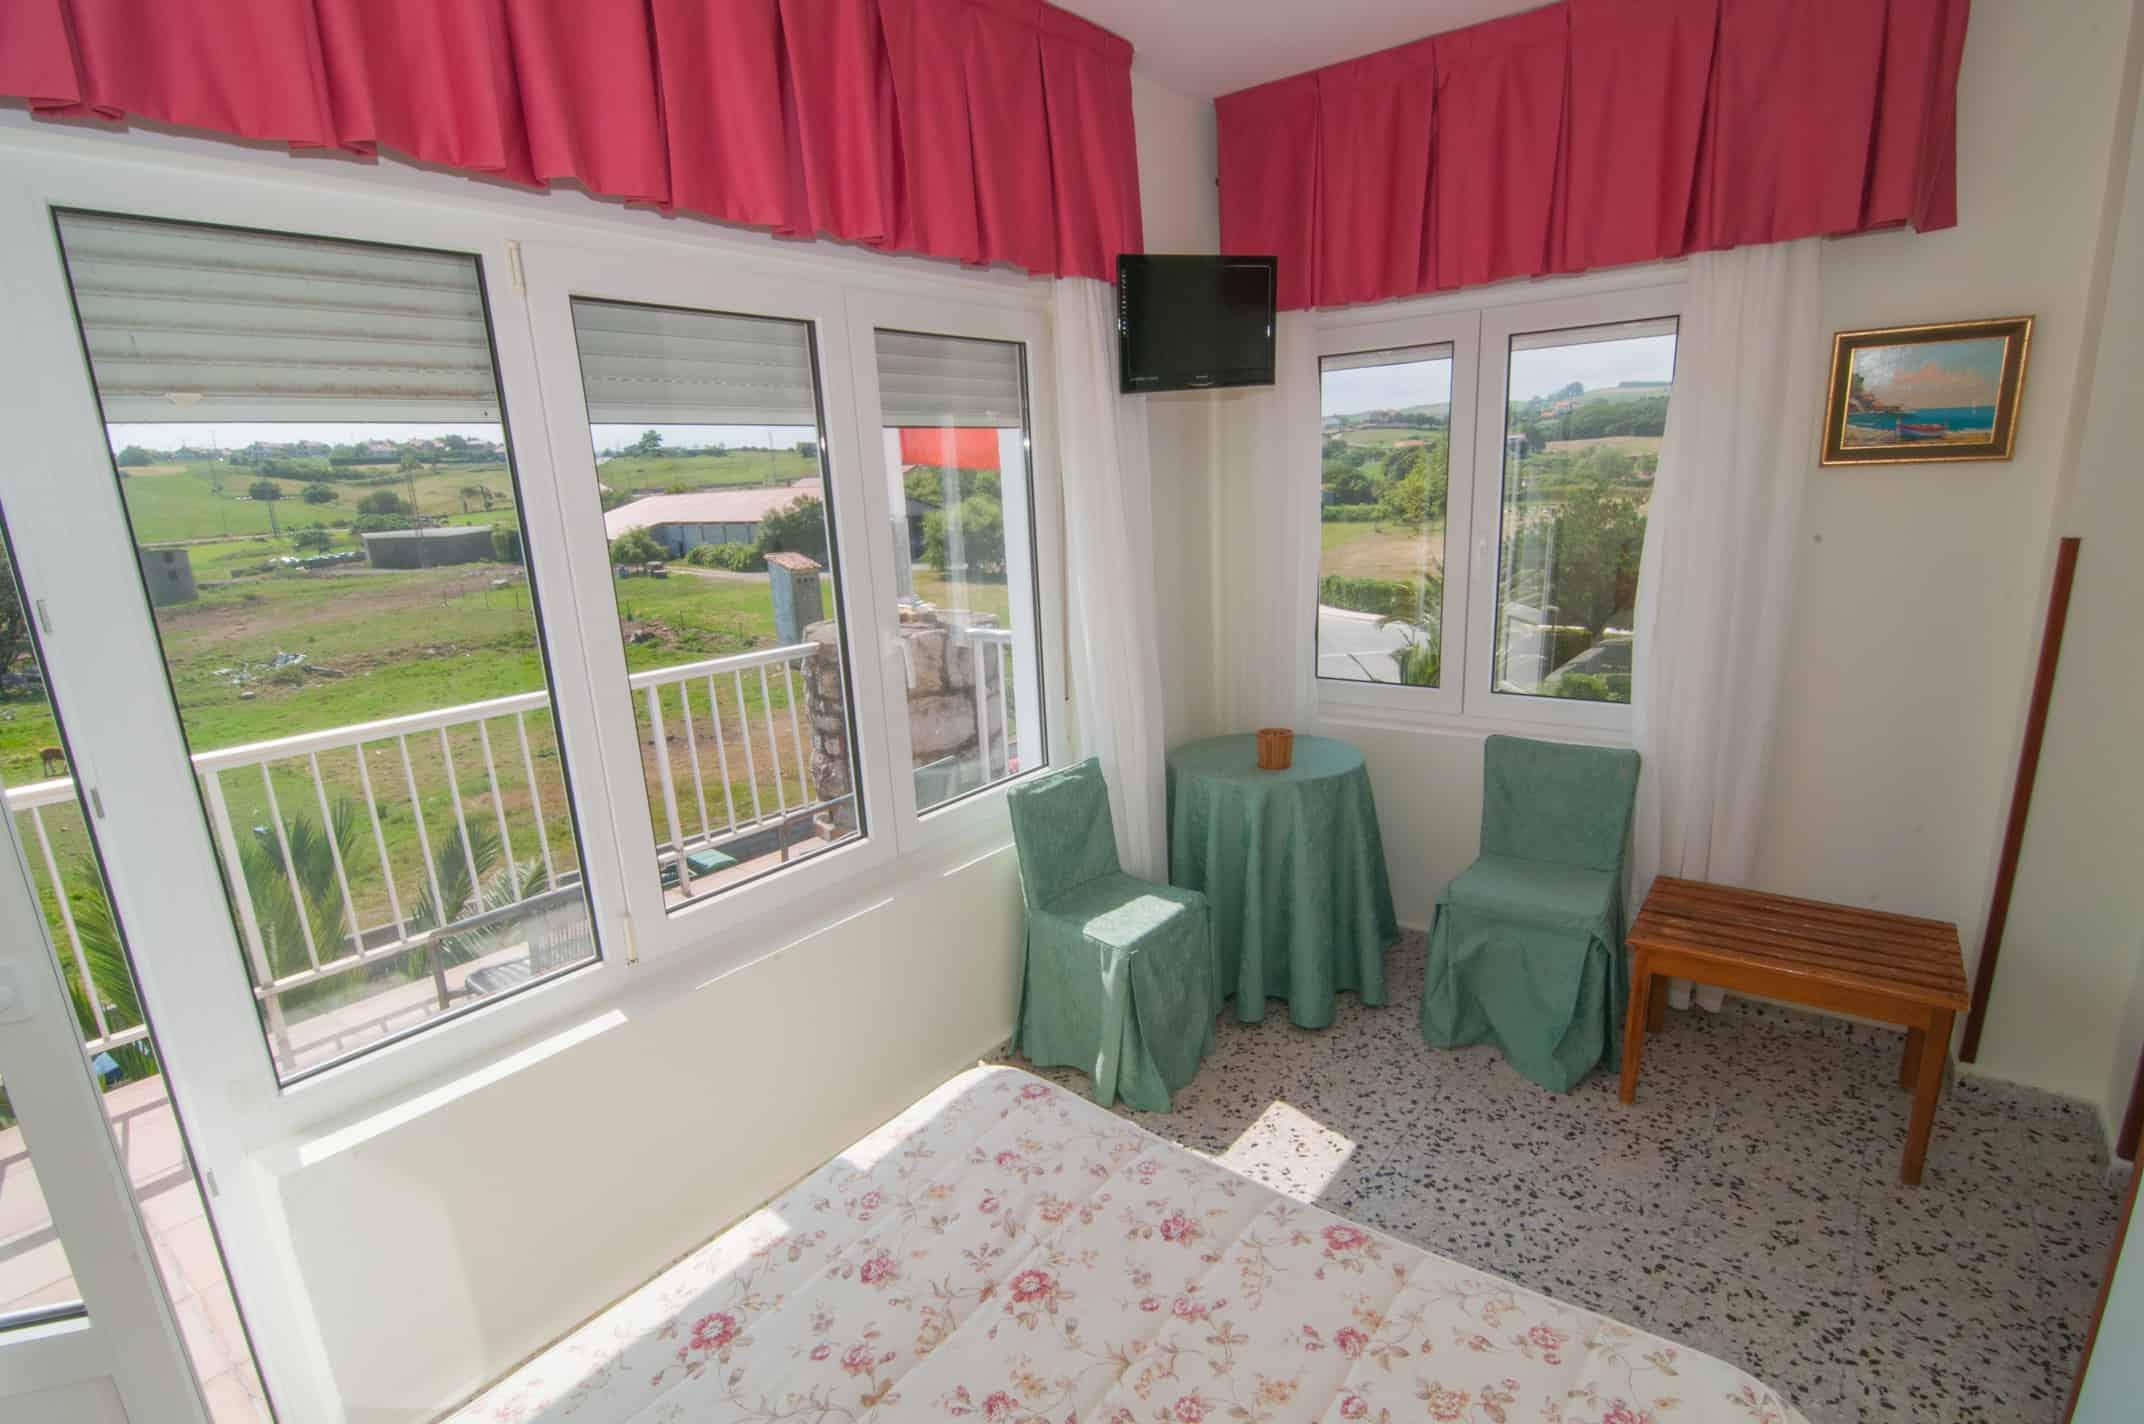 Matrimonio con balc n hotel costa de ajo for Mobiliario balcon